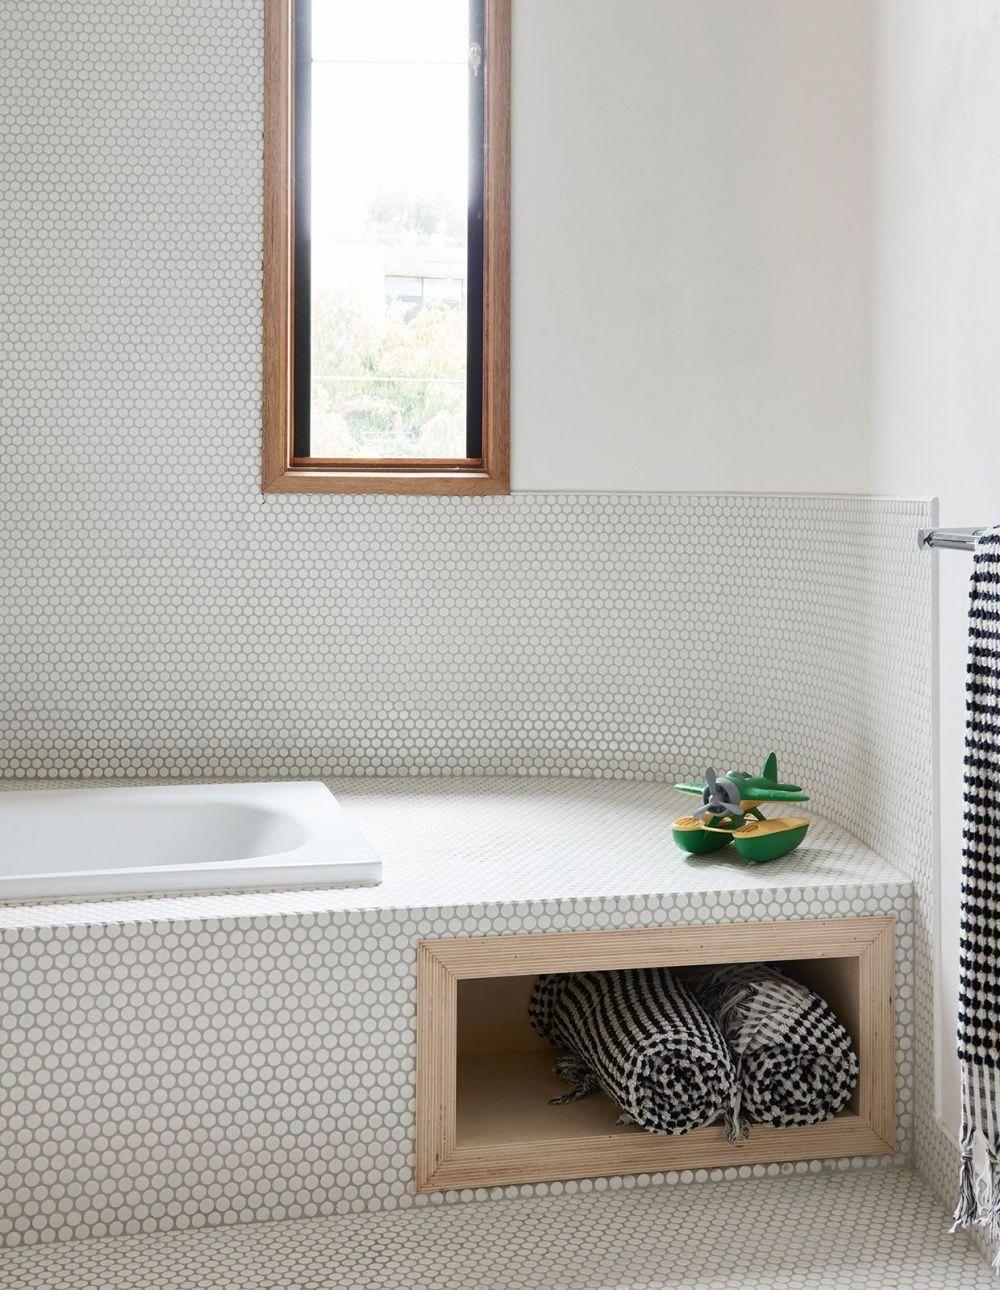 bathroomexperts luxury bath hardware bathroomstyle dreambathroom rh pinterest com